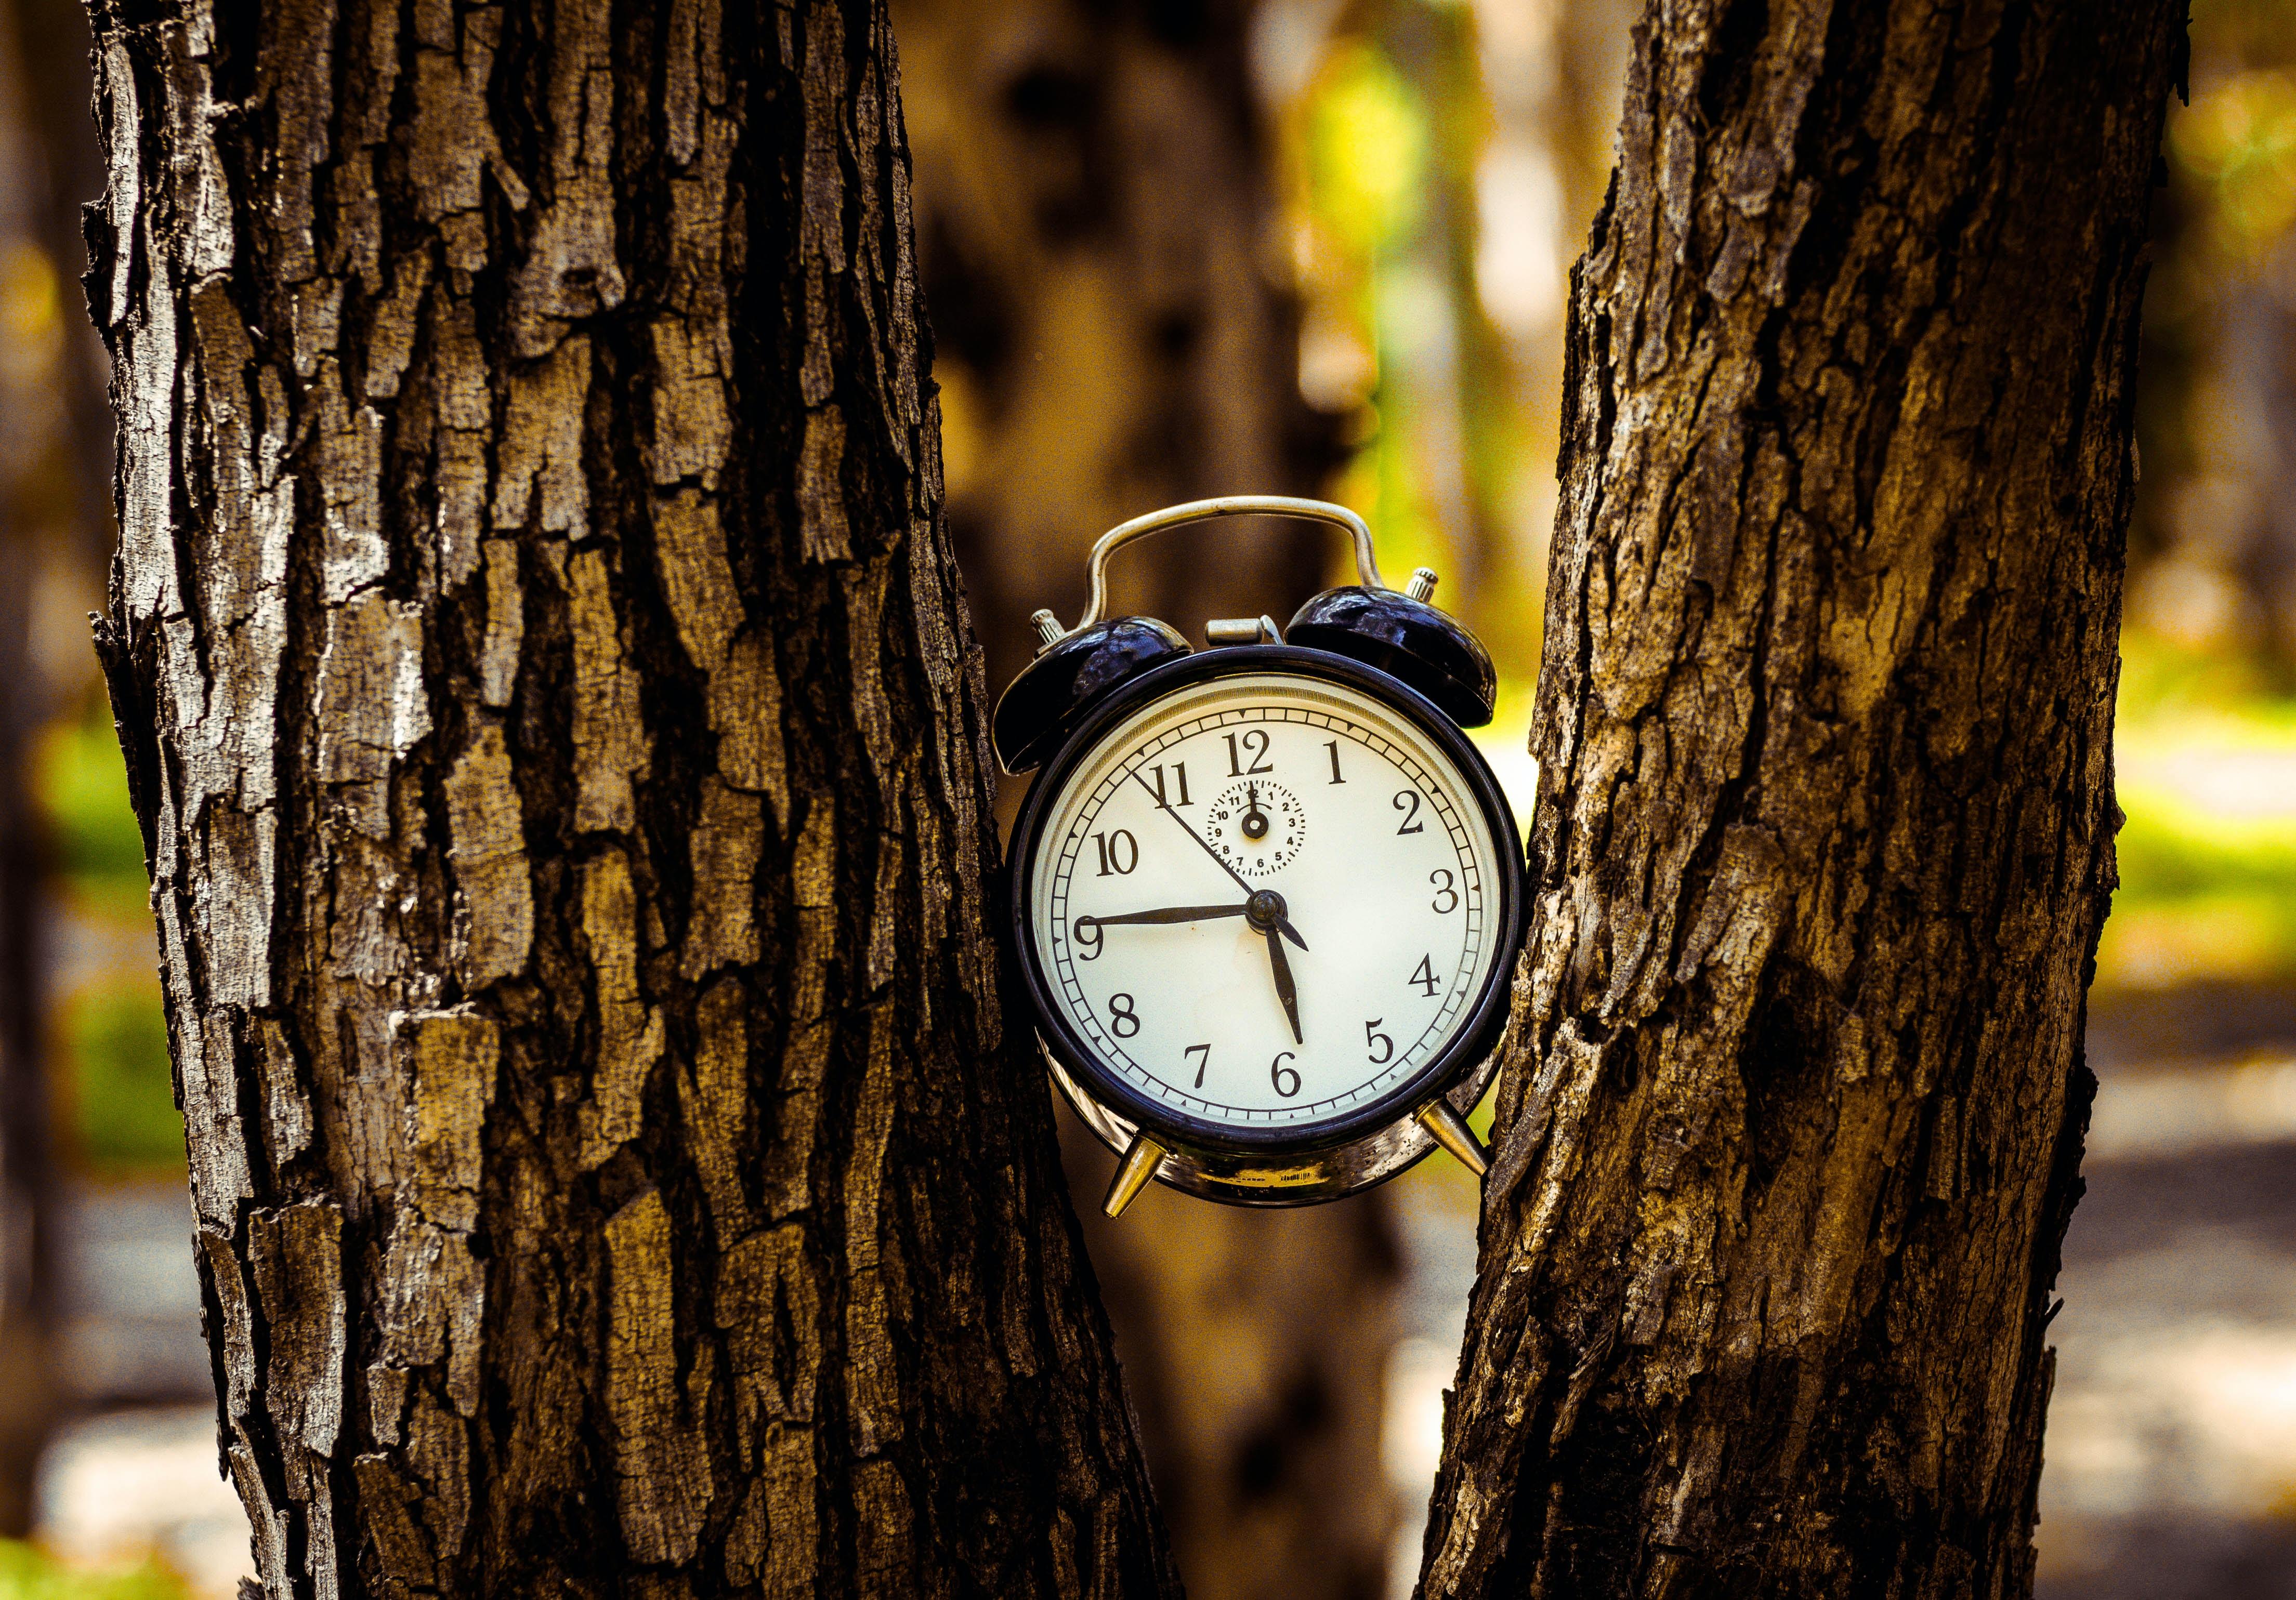 black analog alarm clock between two tree trunks